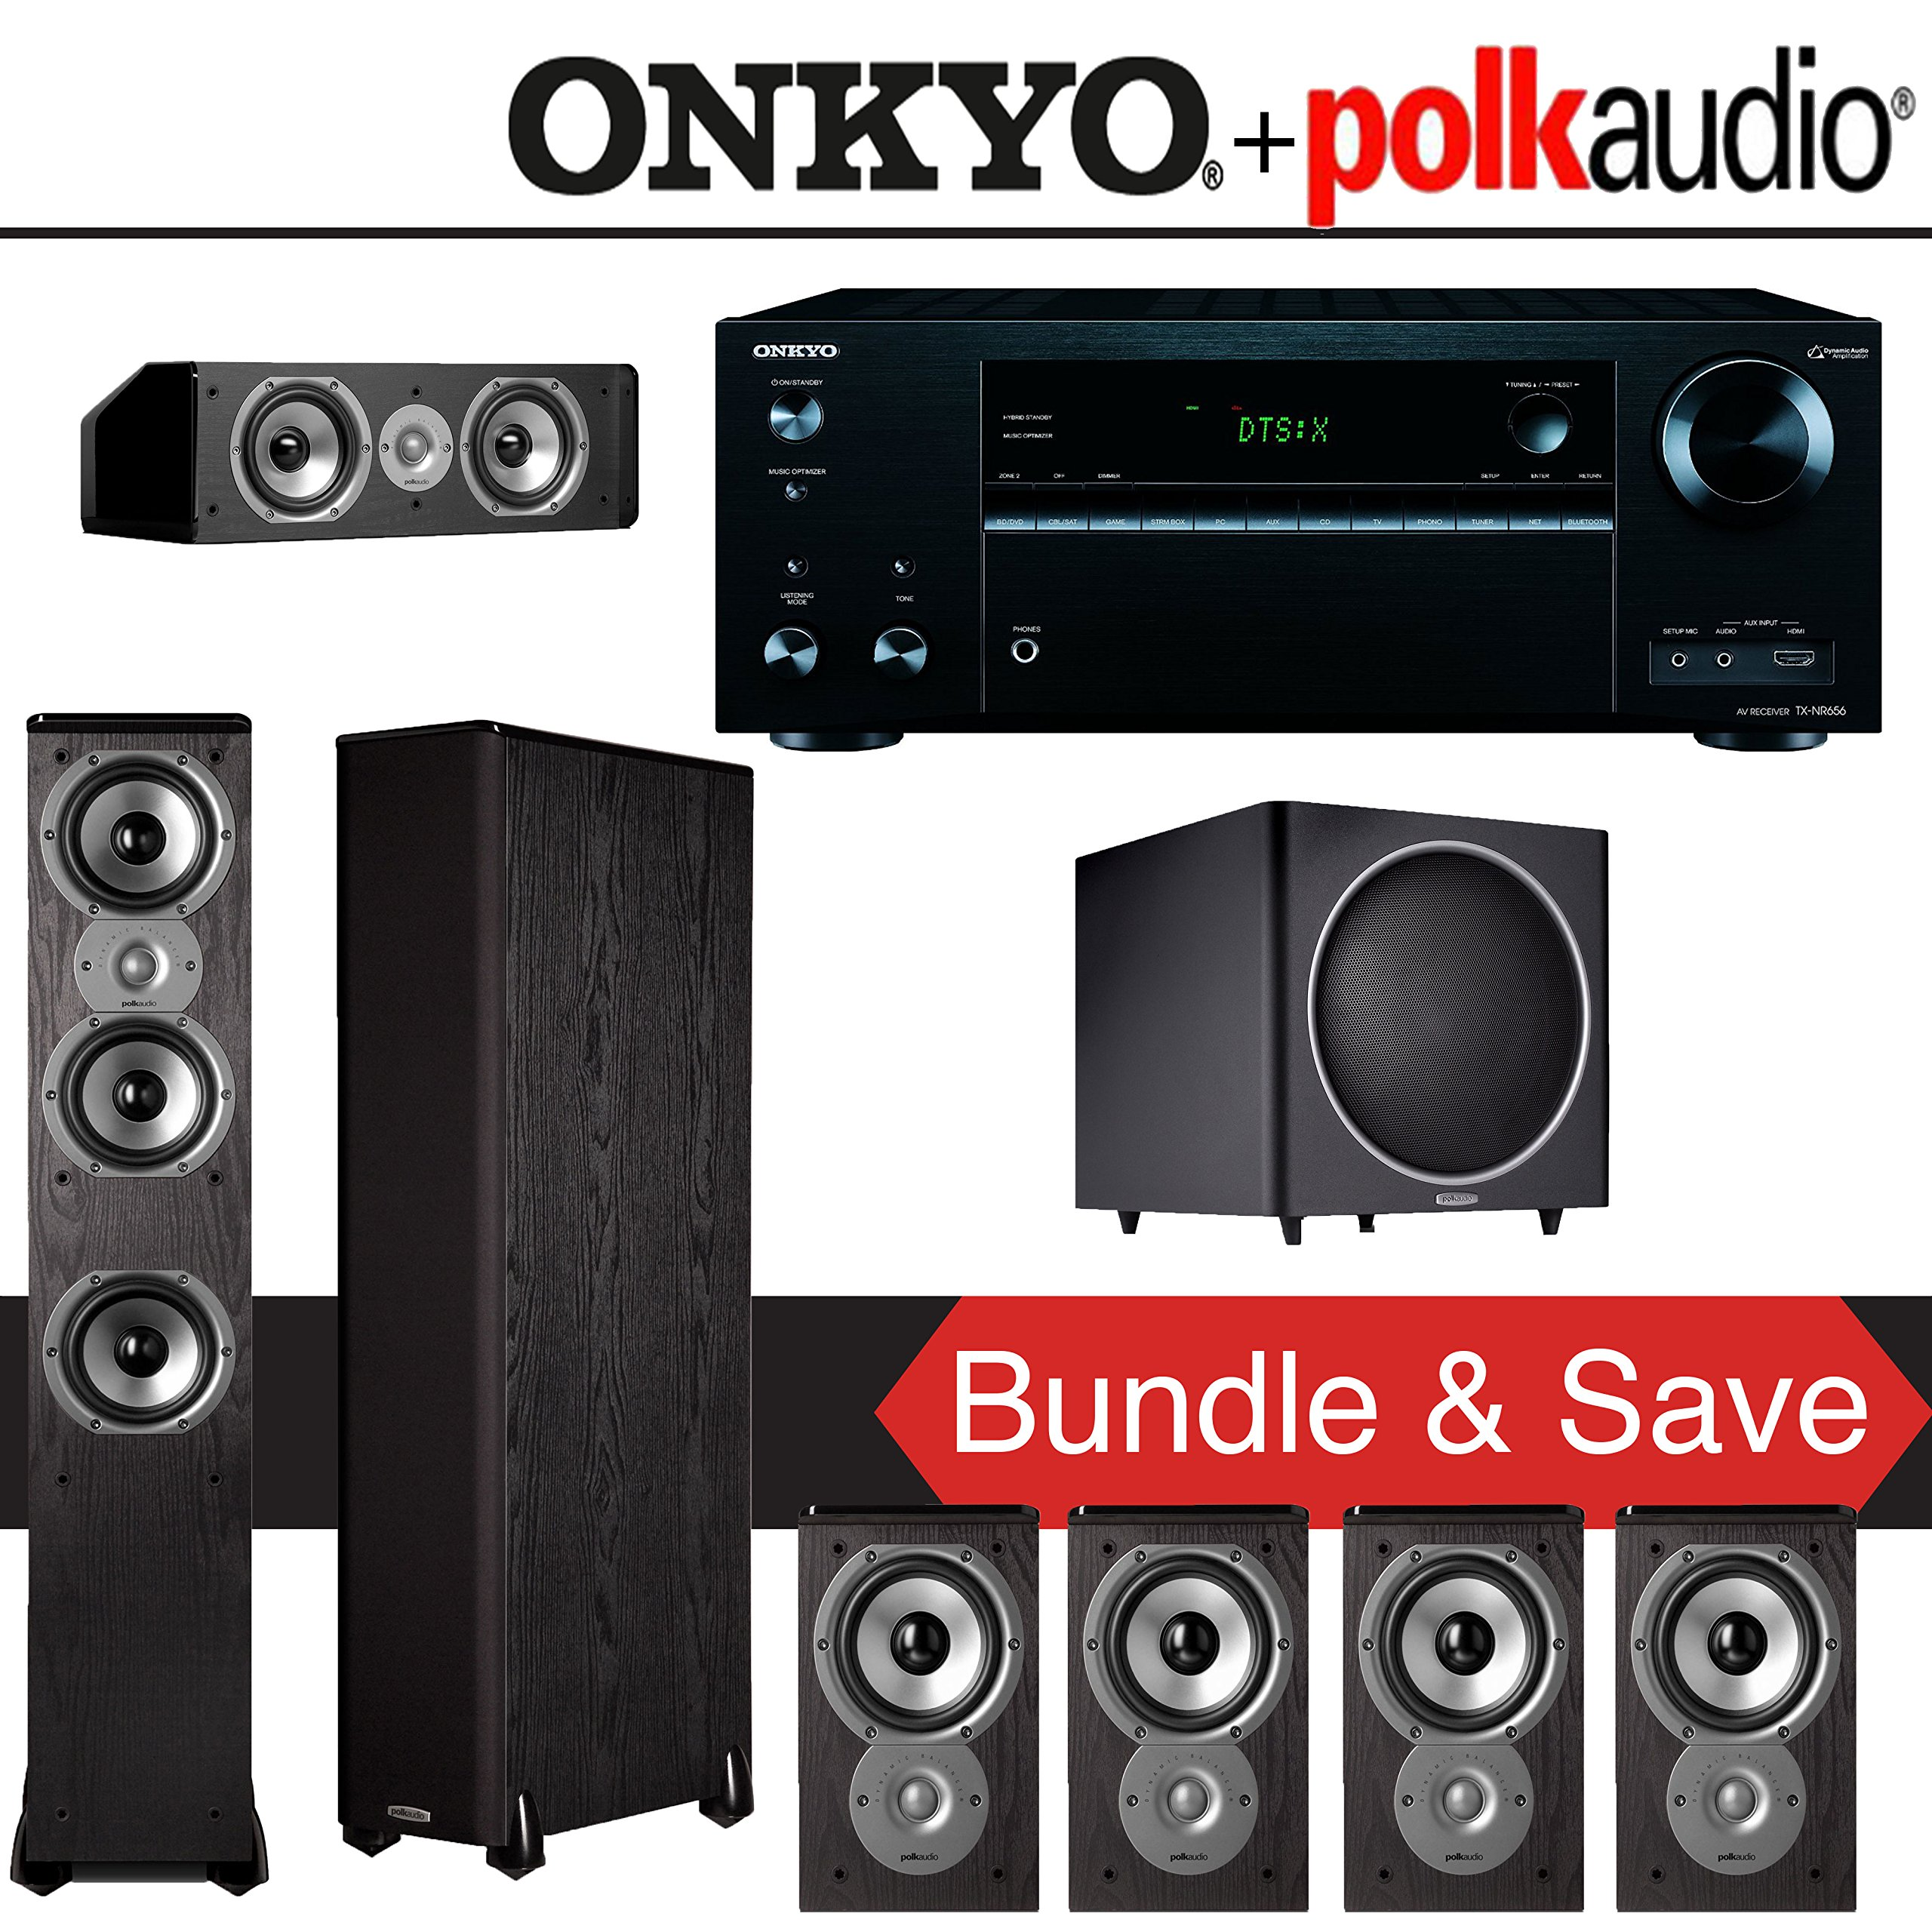 Polk Audio TSi 300 7.1-Ch Home Theater System with Onkyo TX-NR656 7.2-Ch Network AV Receiver by Polk Audio